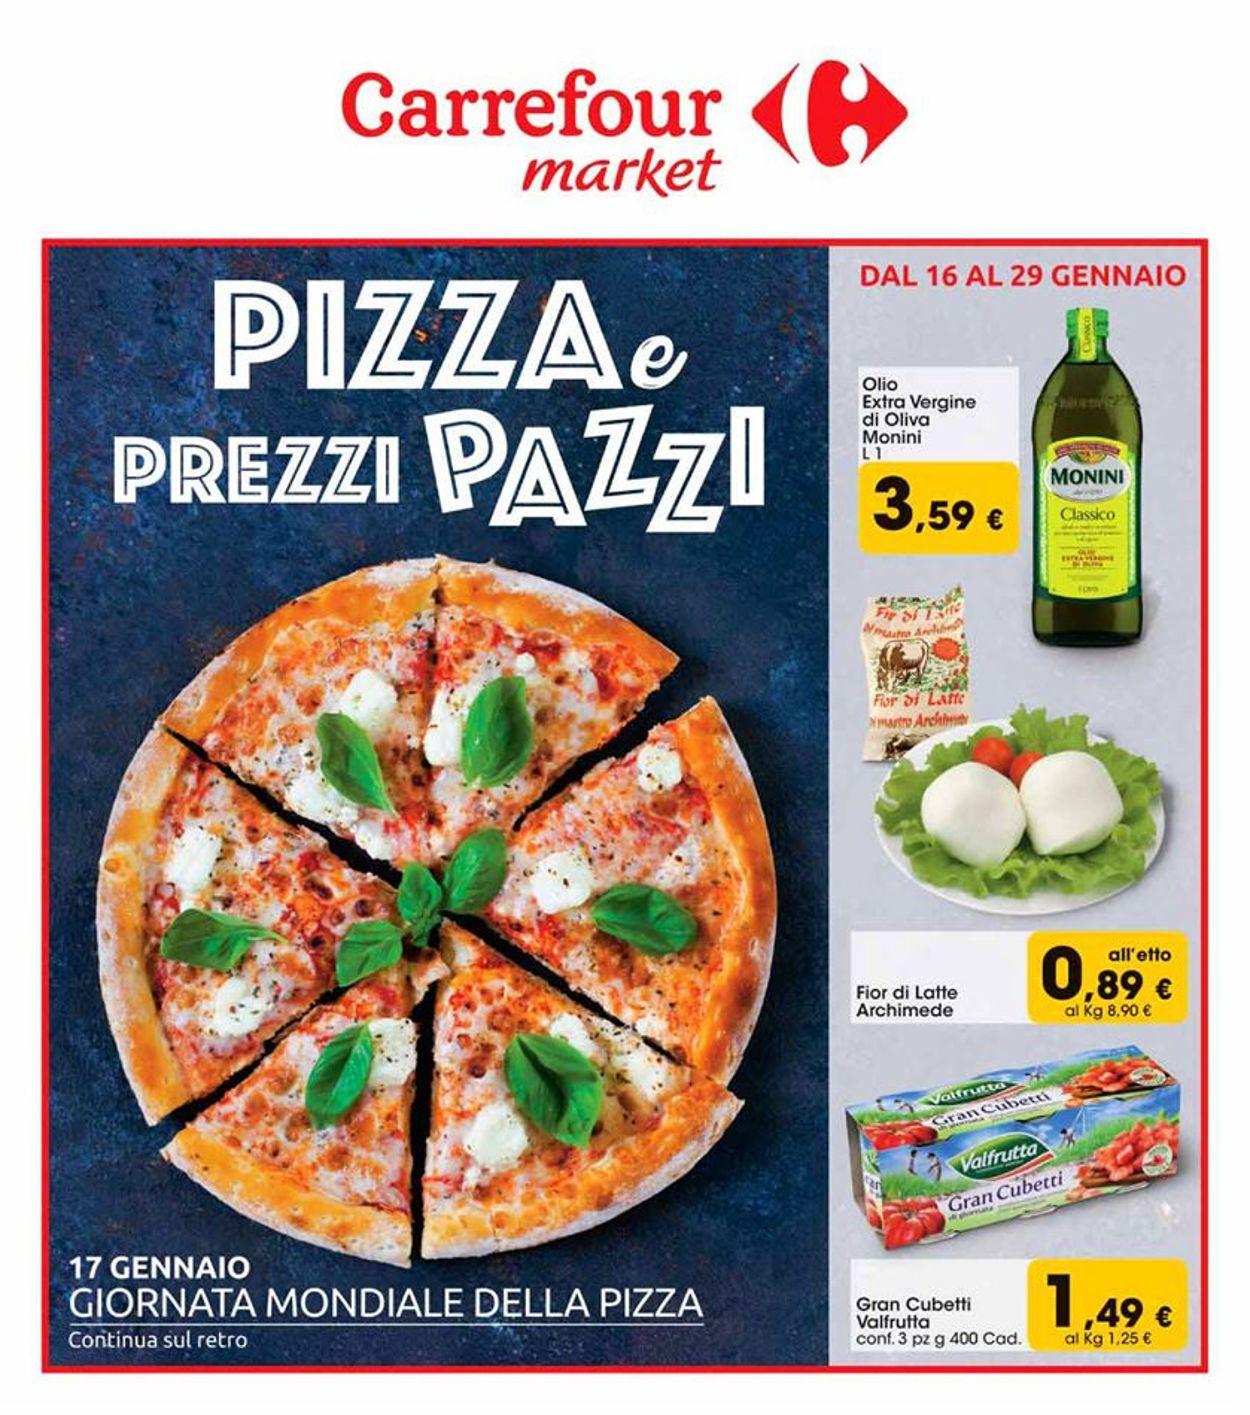 Volantino Carrefour - Offerte 16/01-29/01/2020